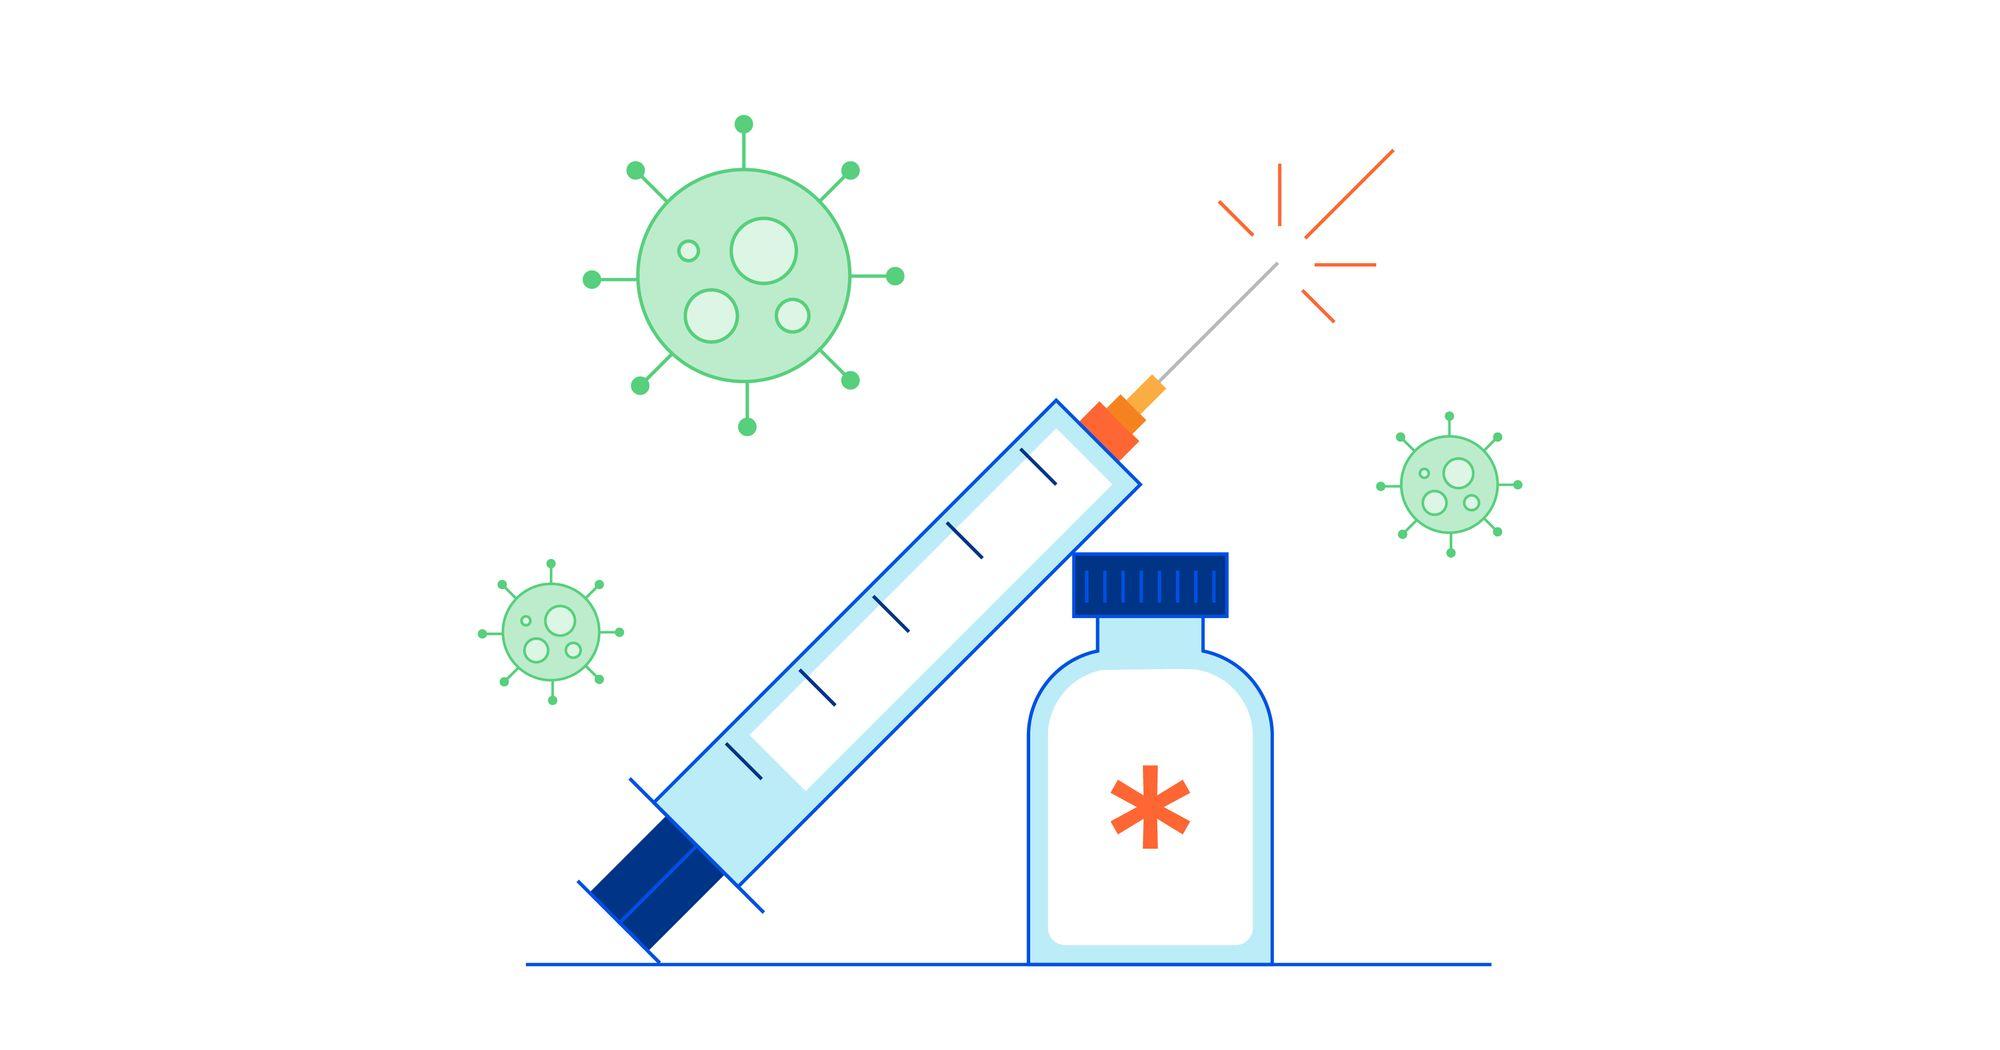 Project Fair Shot 计划启动:确保 COVID-19 疫苗登记网站能够满足需求